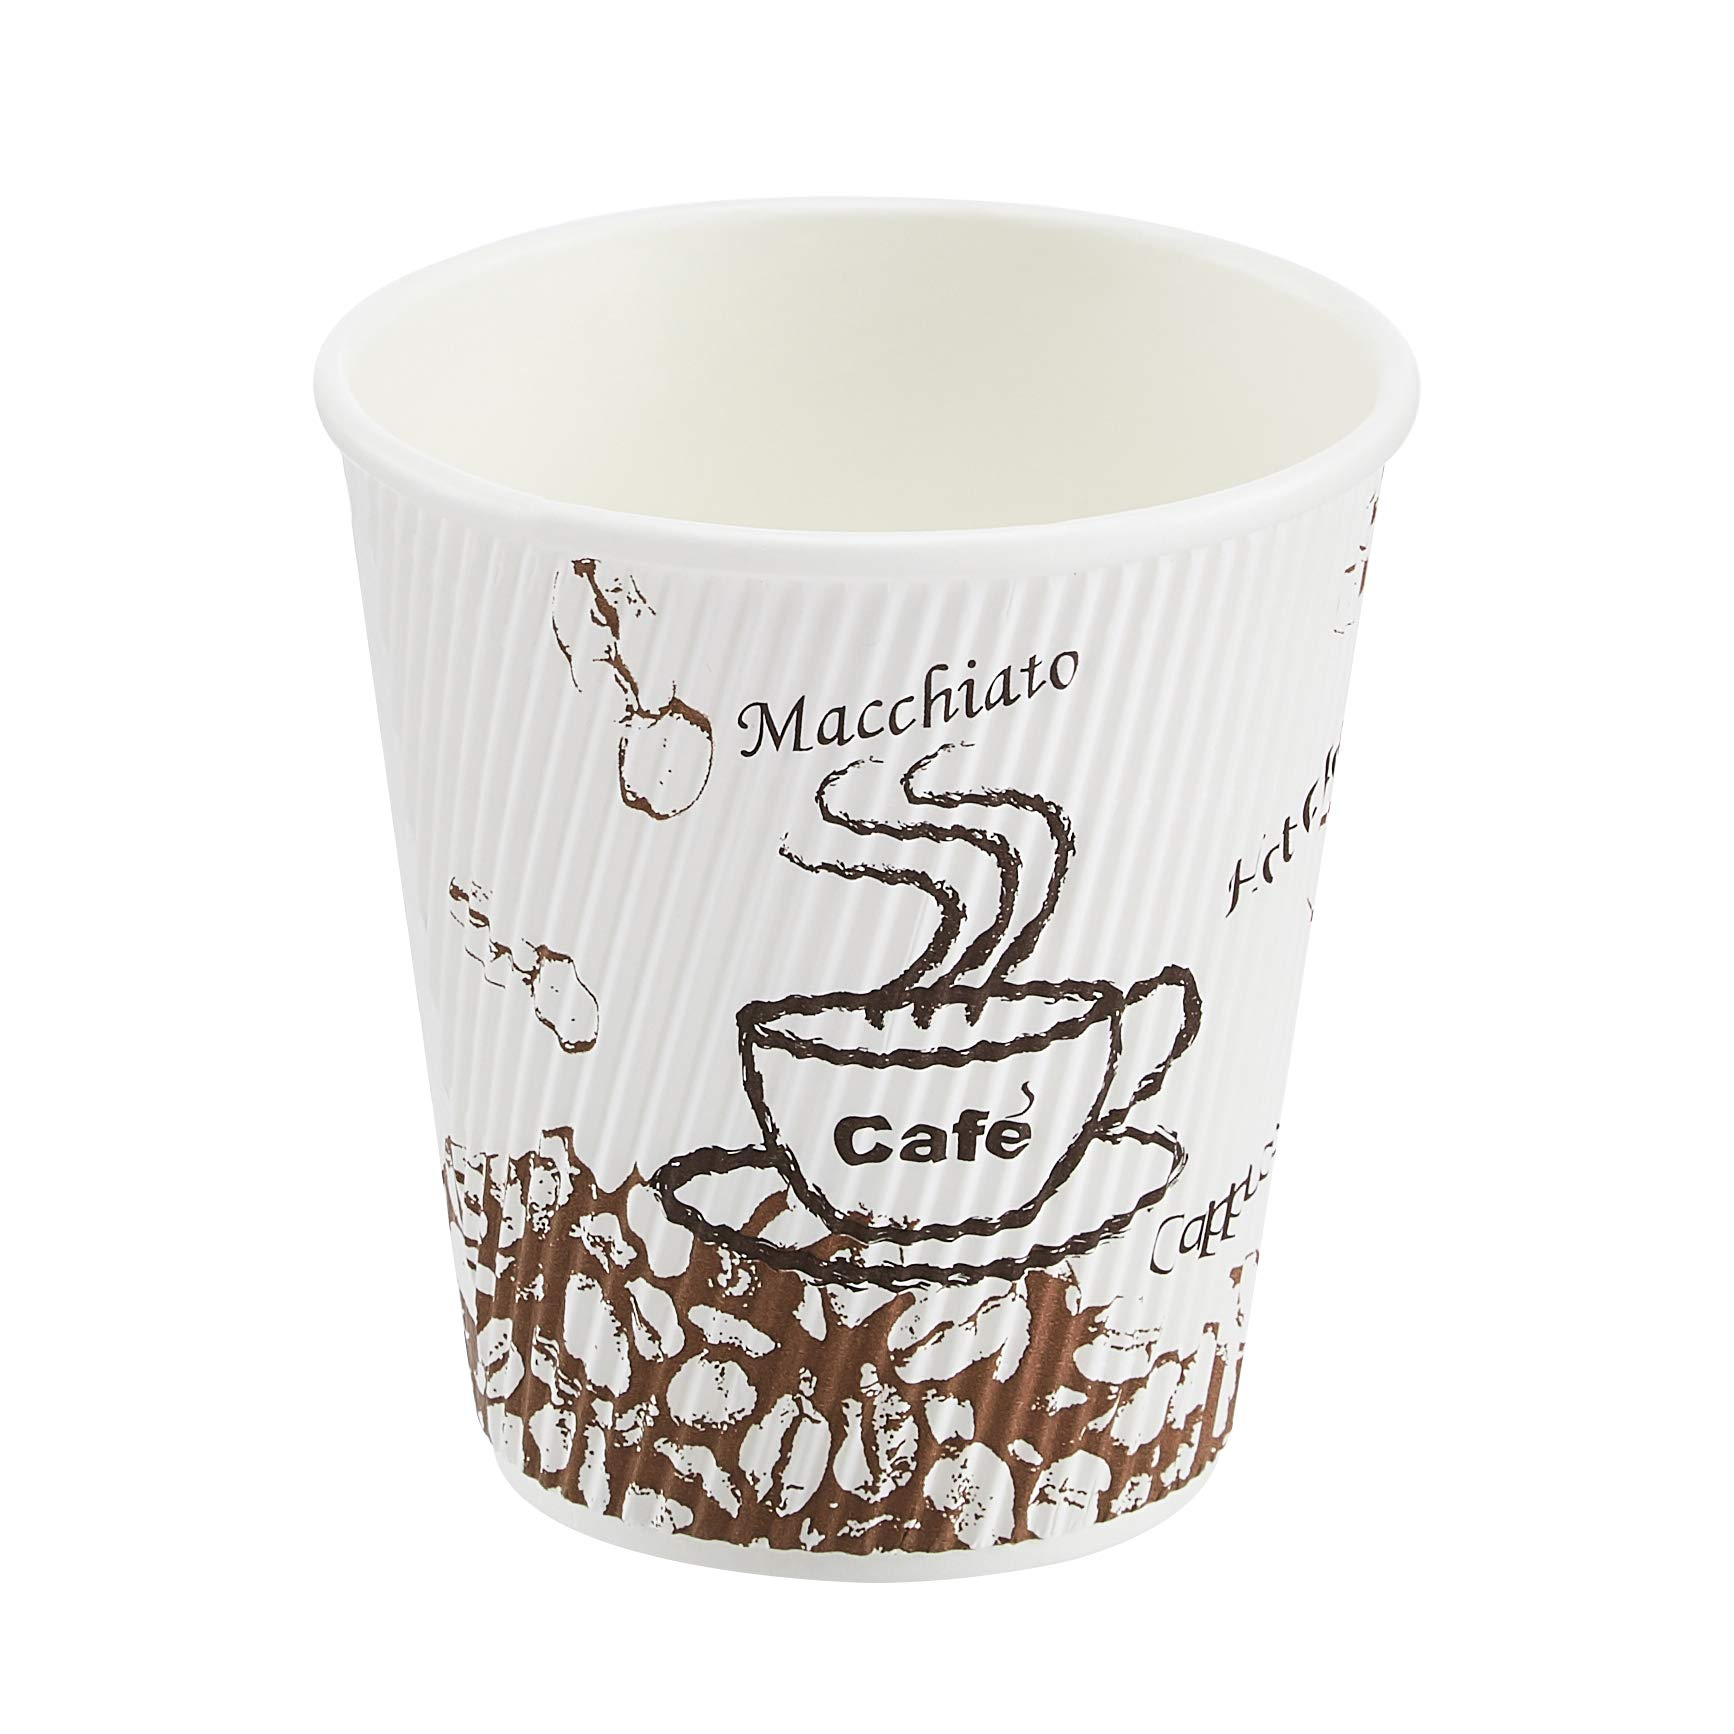 Amazon Basics Insulated Ripple Wall Hot Cup, Café Design, 10 oz, 240-Count